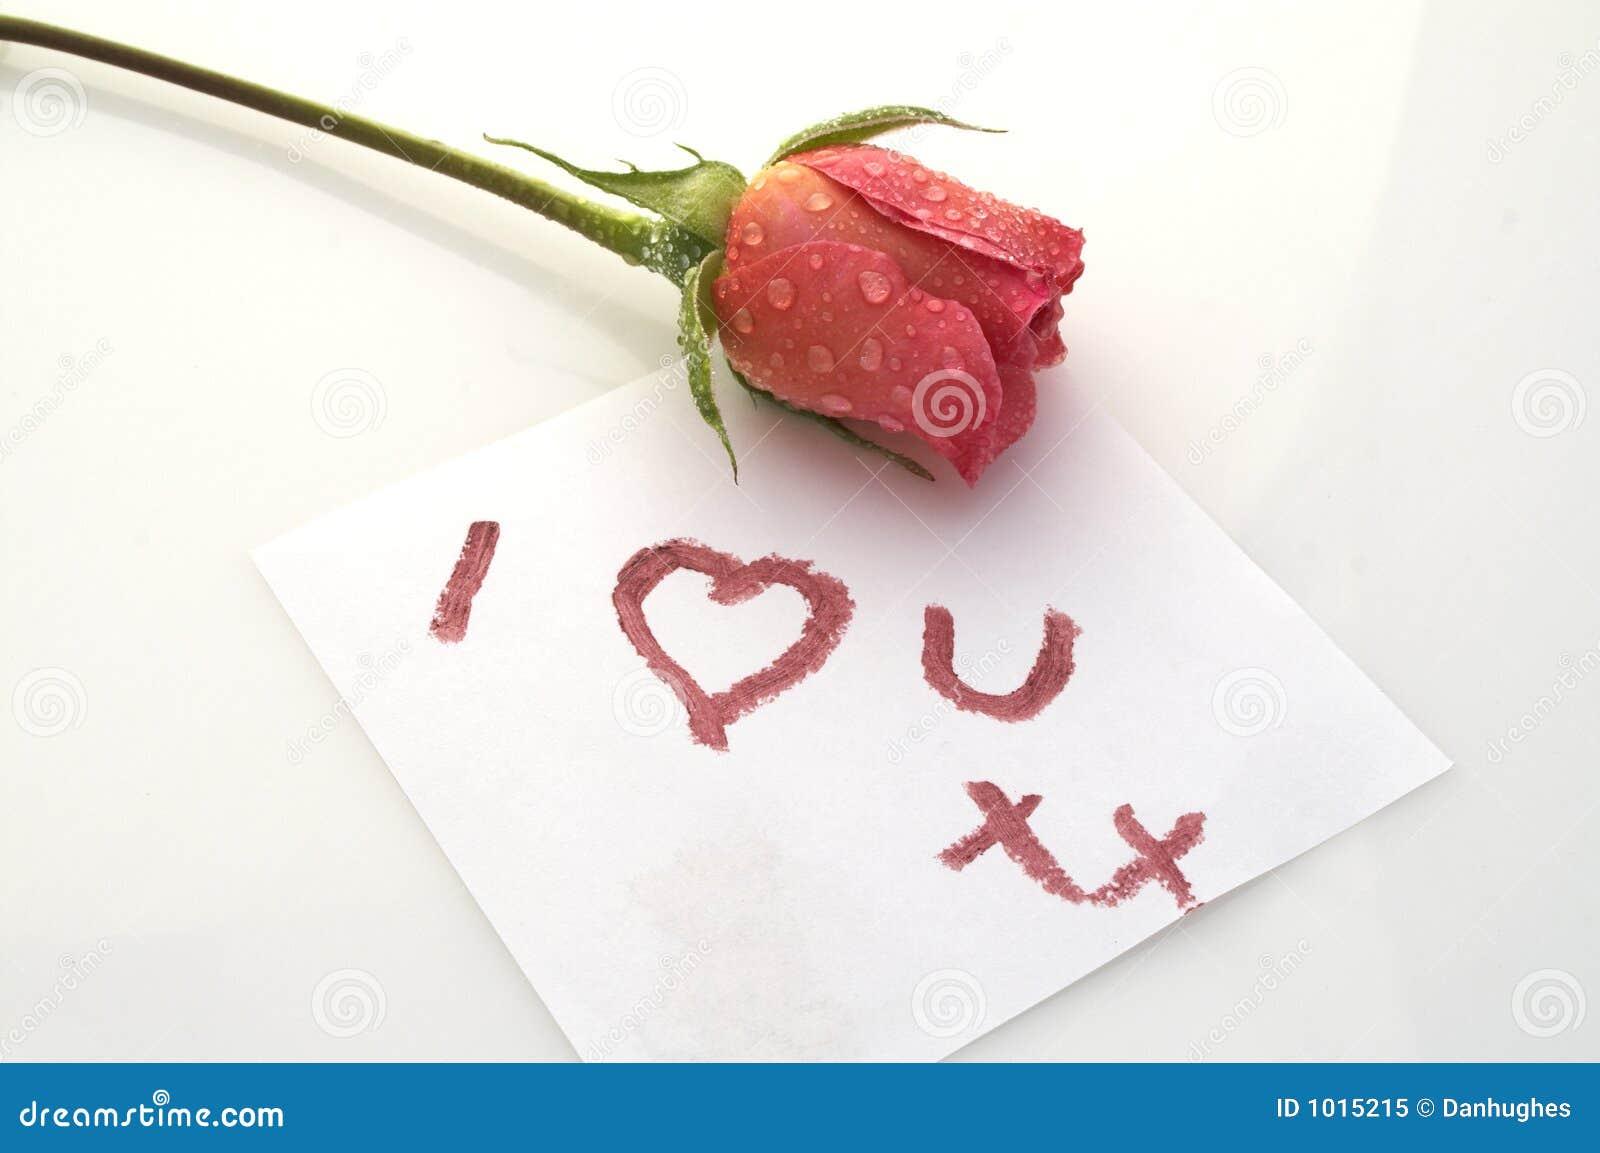 I Love You Rose Royalty Free Stock Photo - Image: 1015215